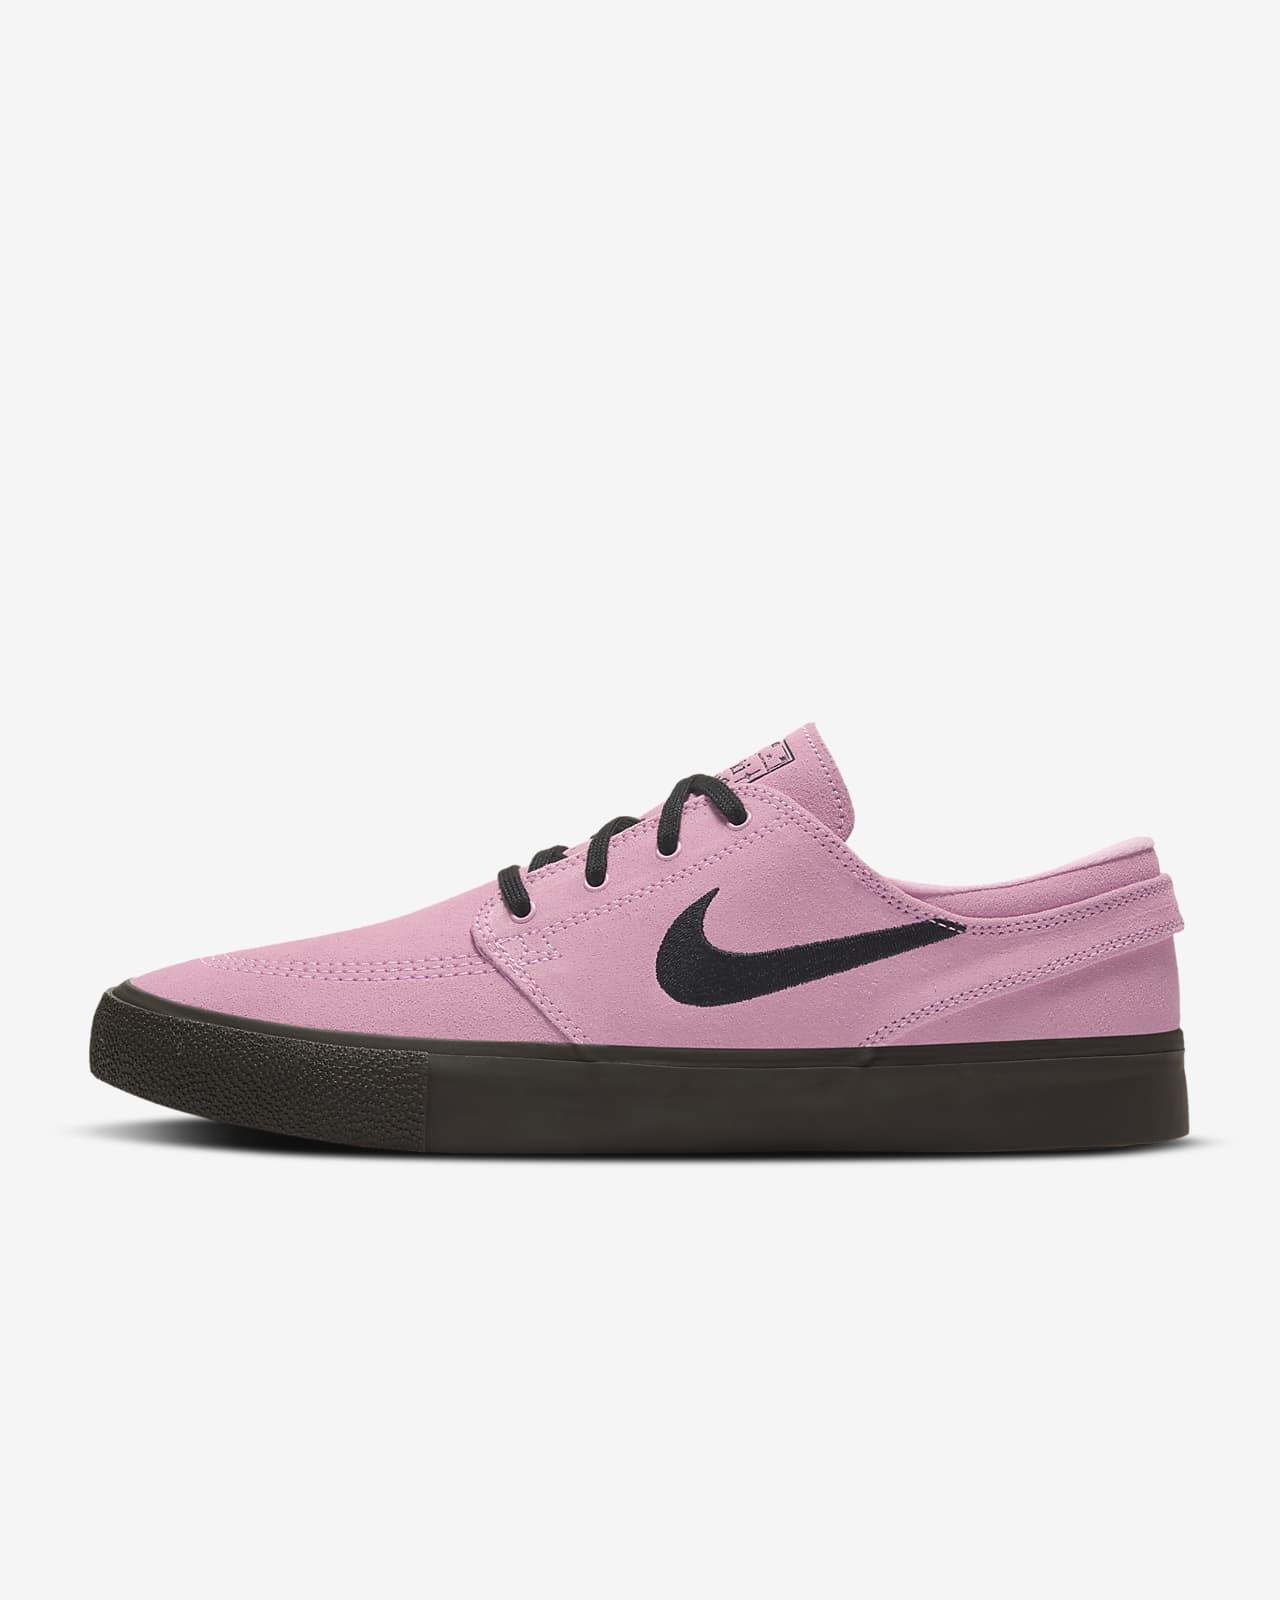 Nike SB Zoom Stefan Janoski RM Skate